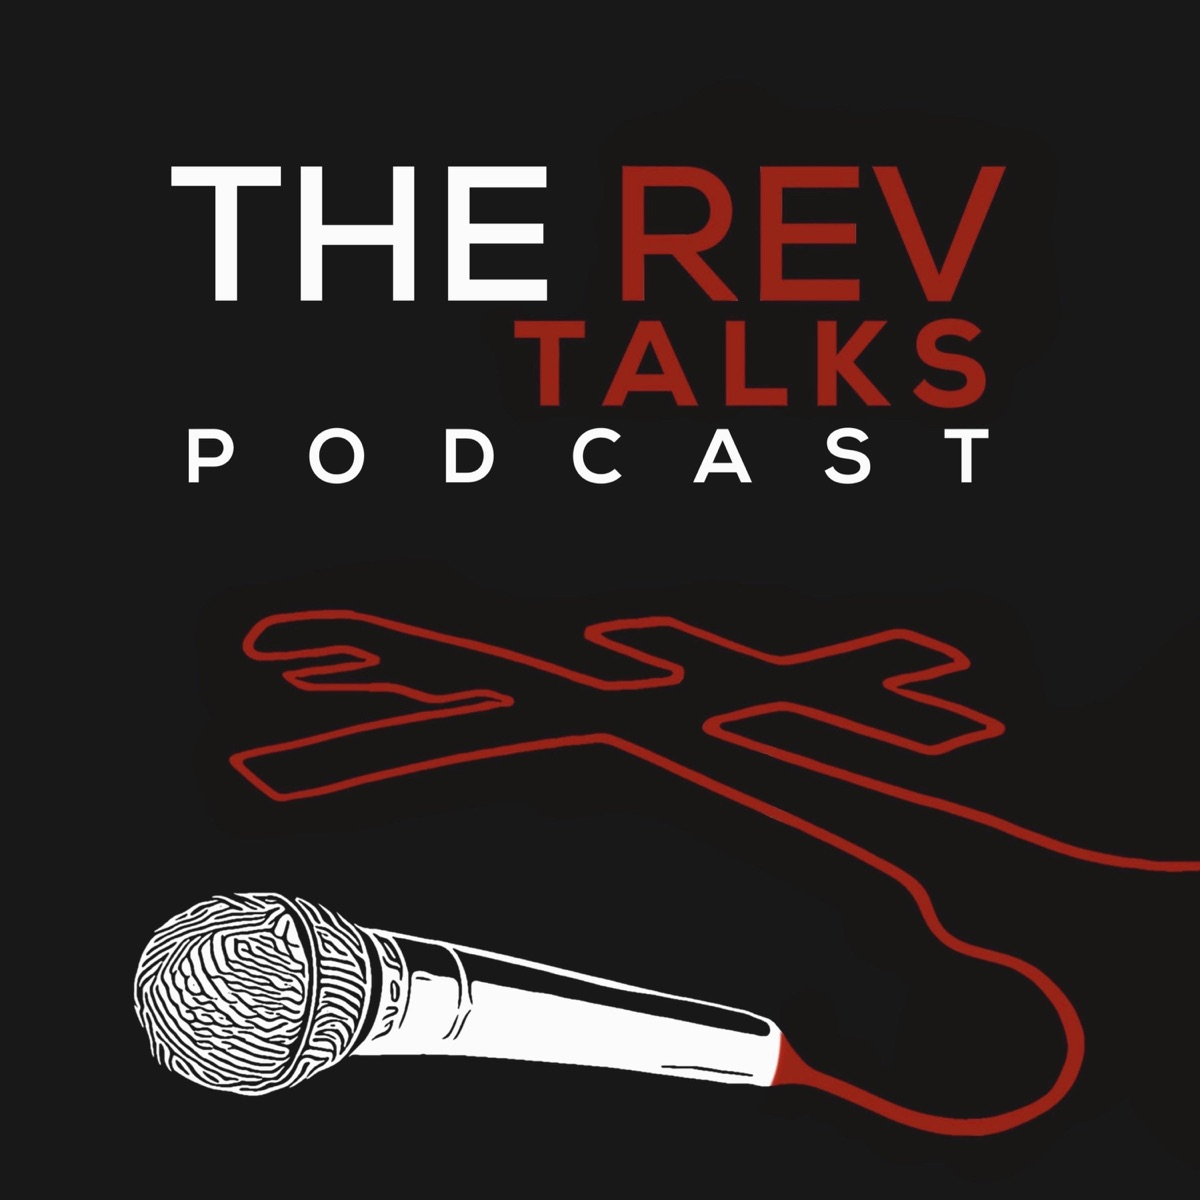 the REV talks